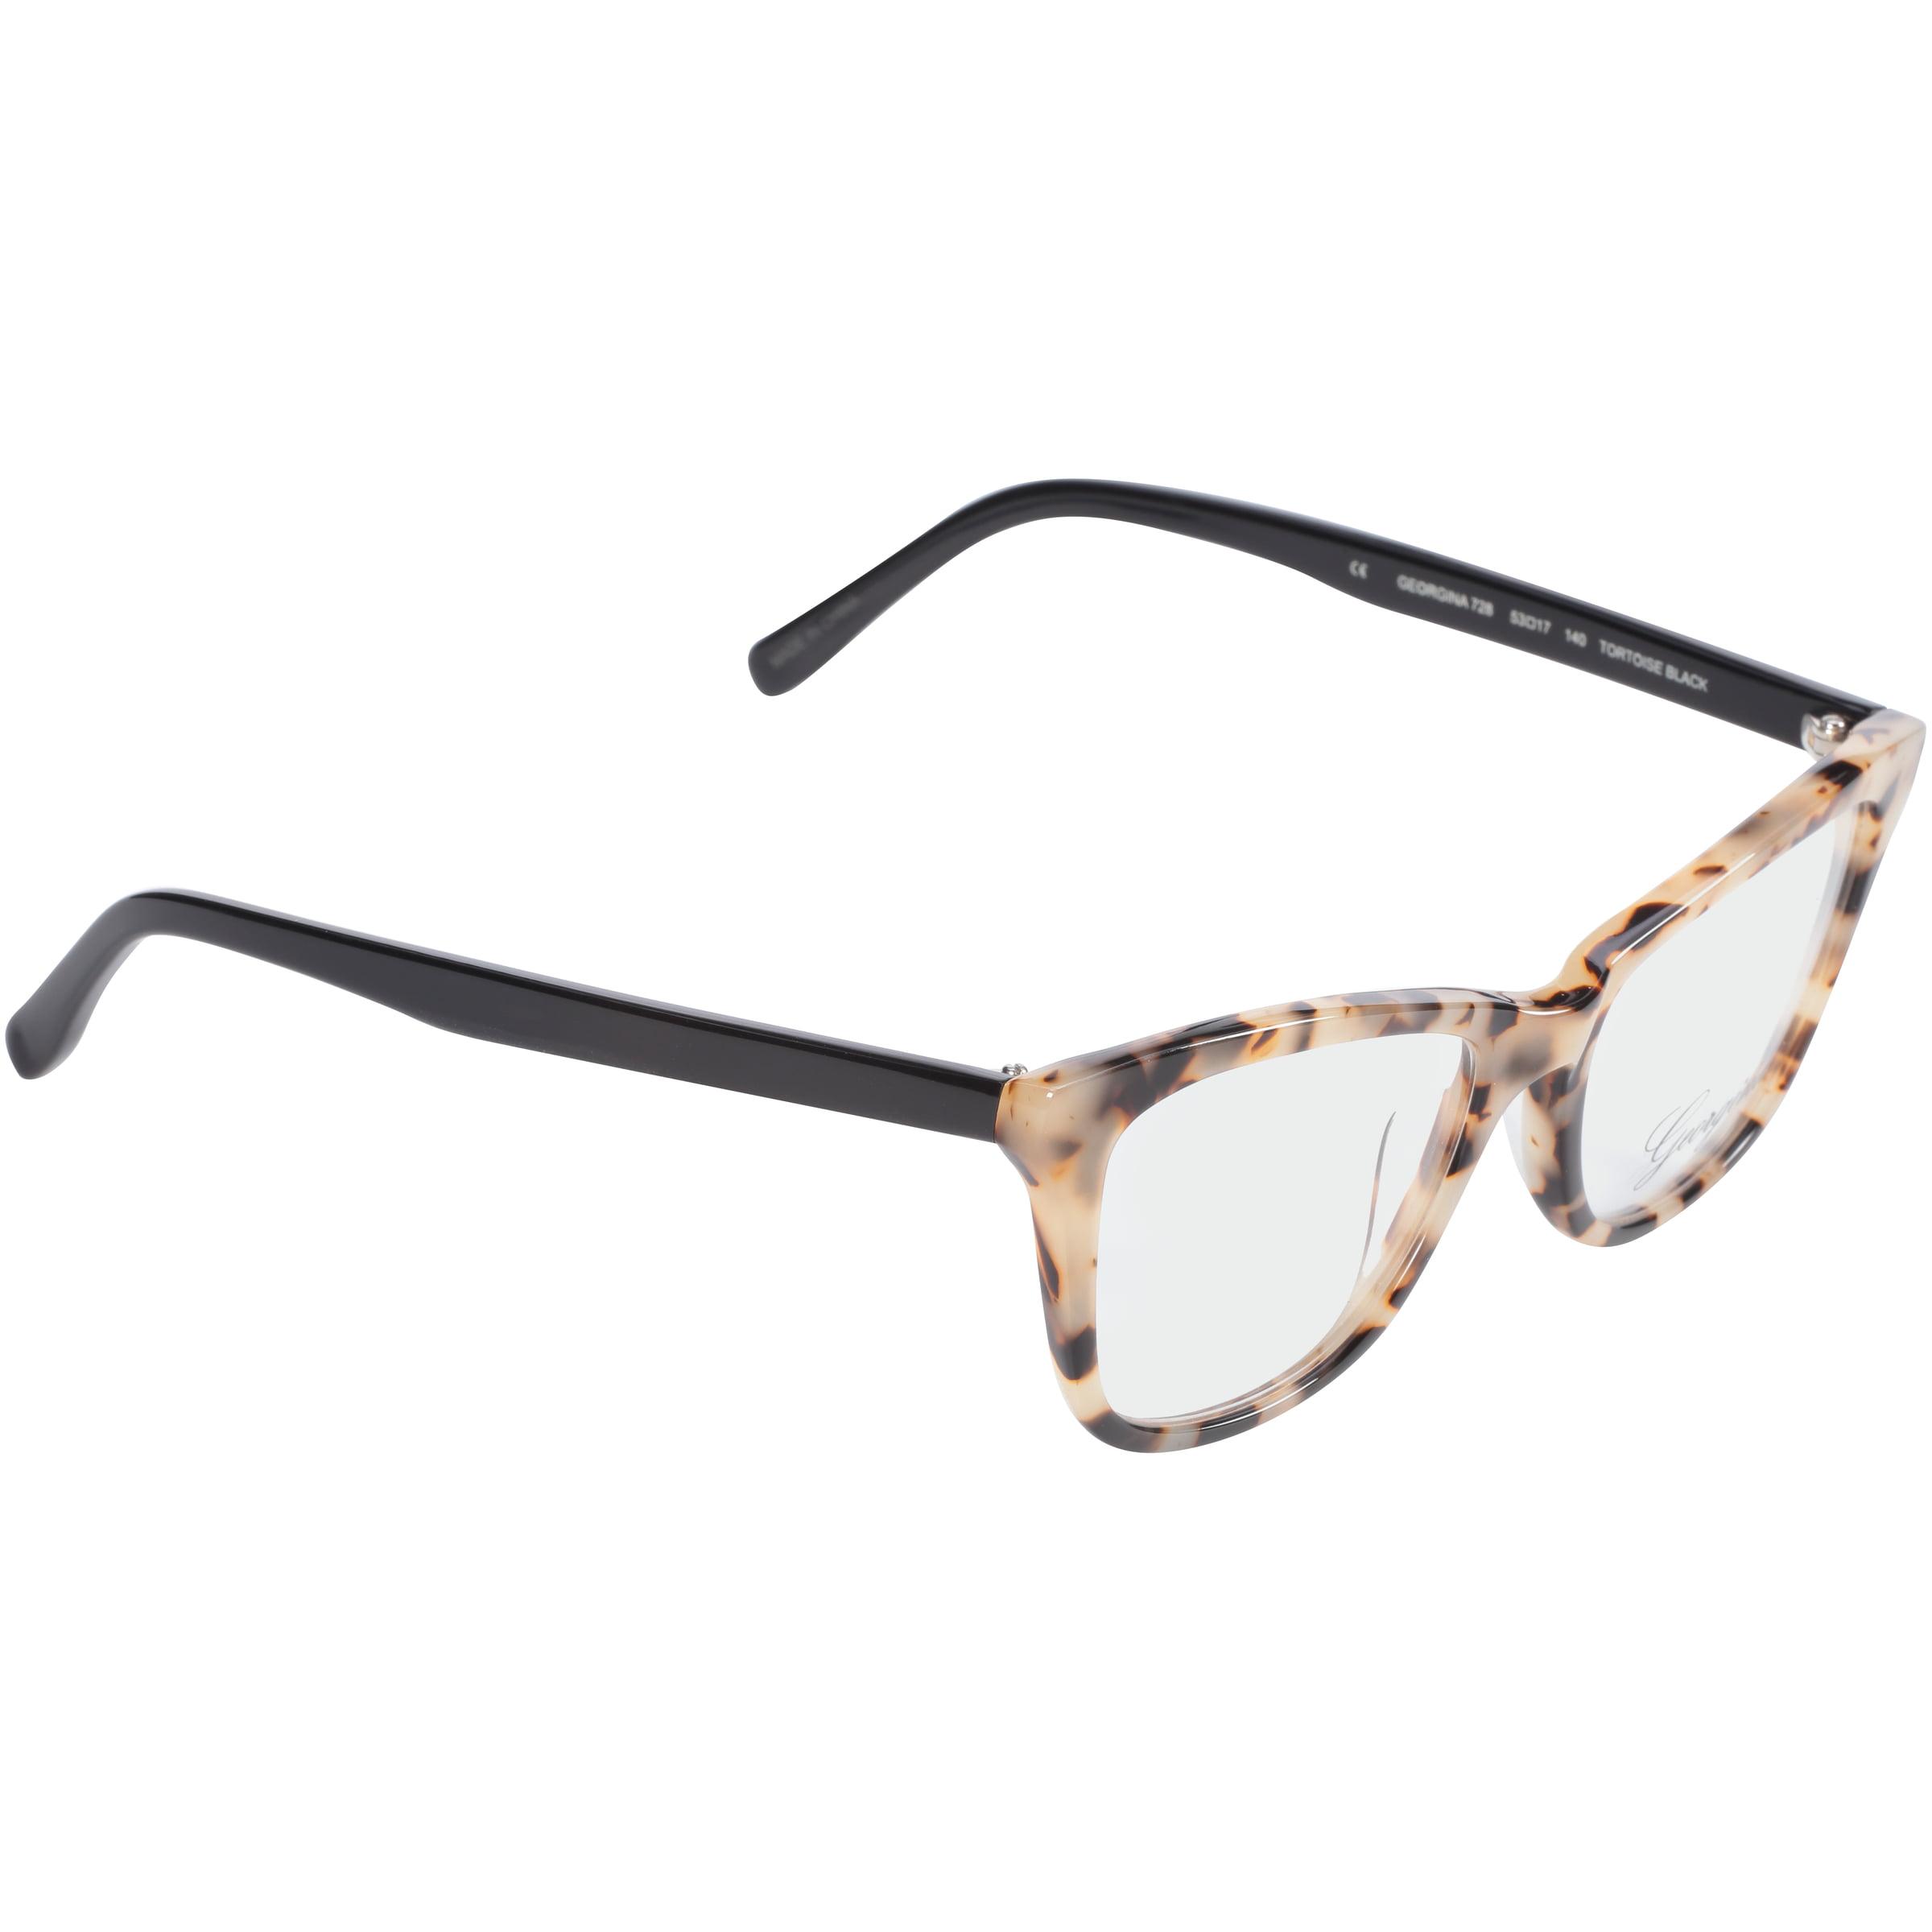 Oleg cassini fashion sunglasses 14